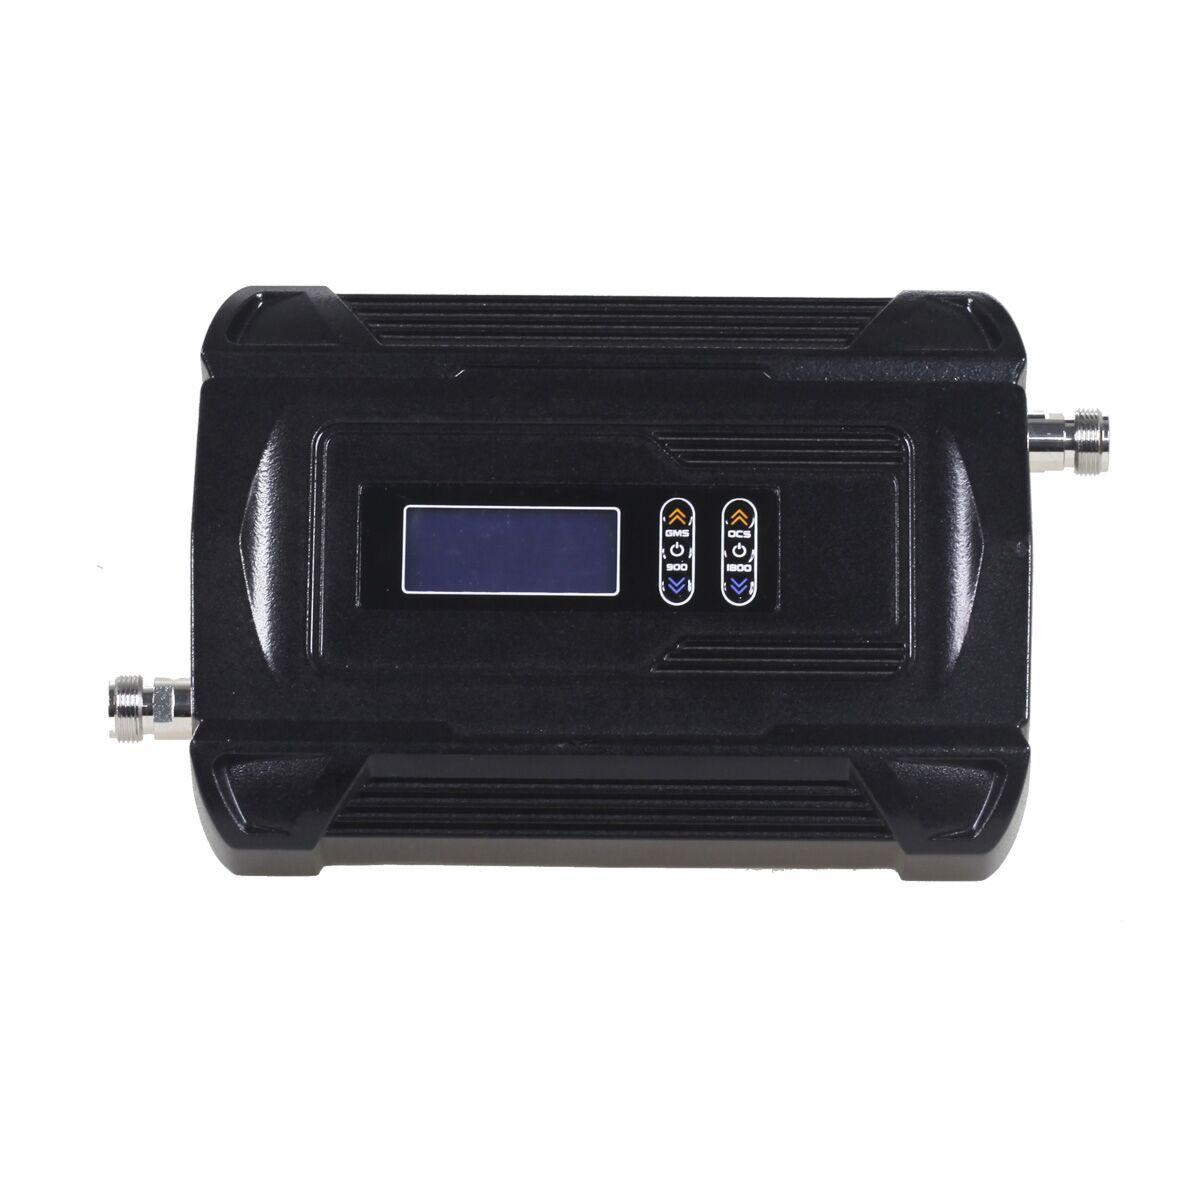 Mini Booster- Vodafone / O2 / Three - Voice & 3G Data - 4G Lite EE